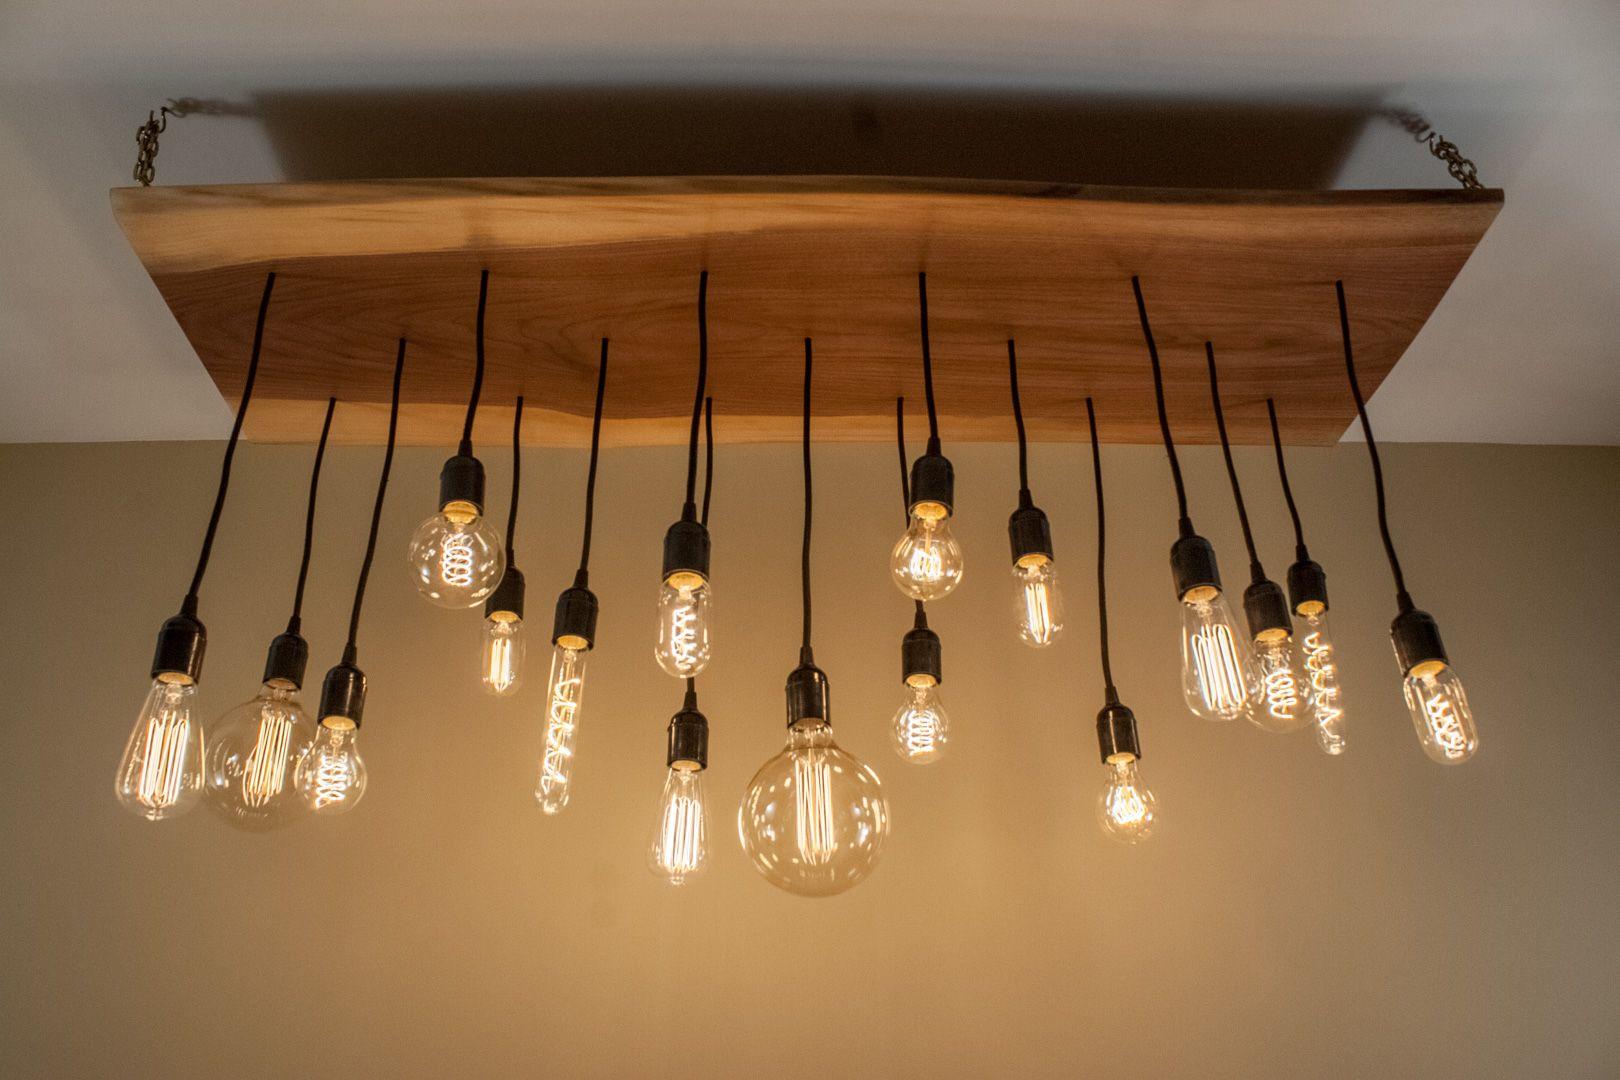 Rustic Chandelier With Edison Bulbs Large 19 Pendant Live Edge